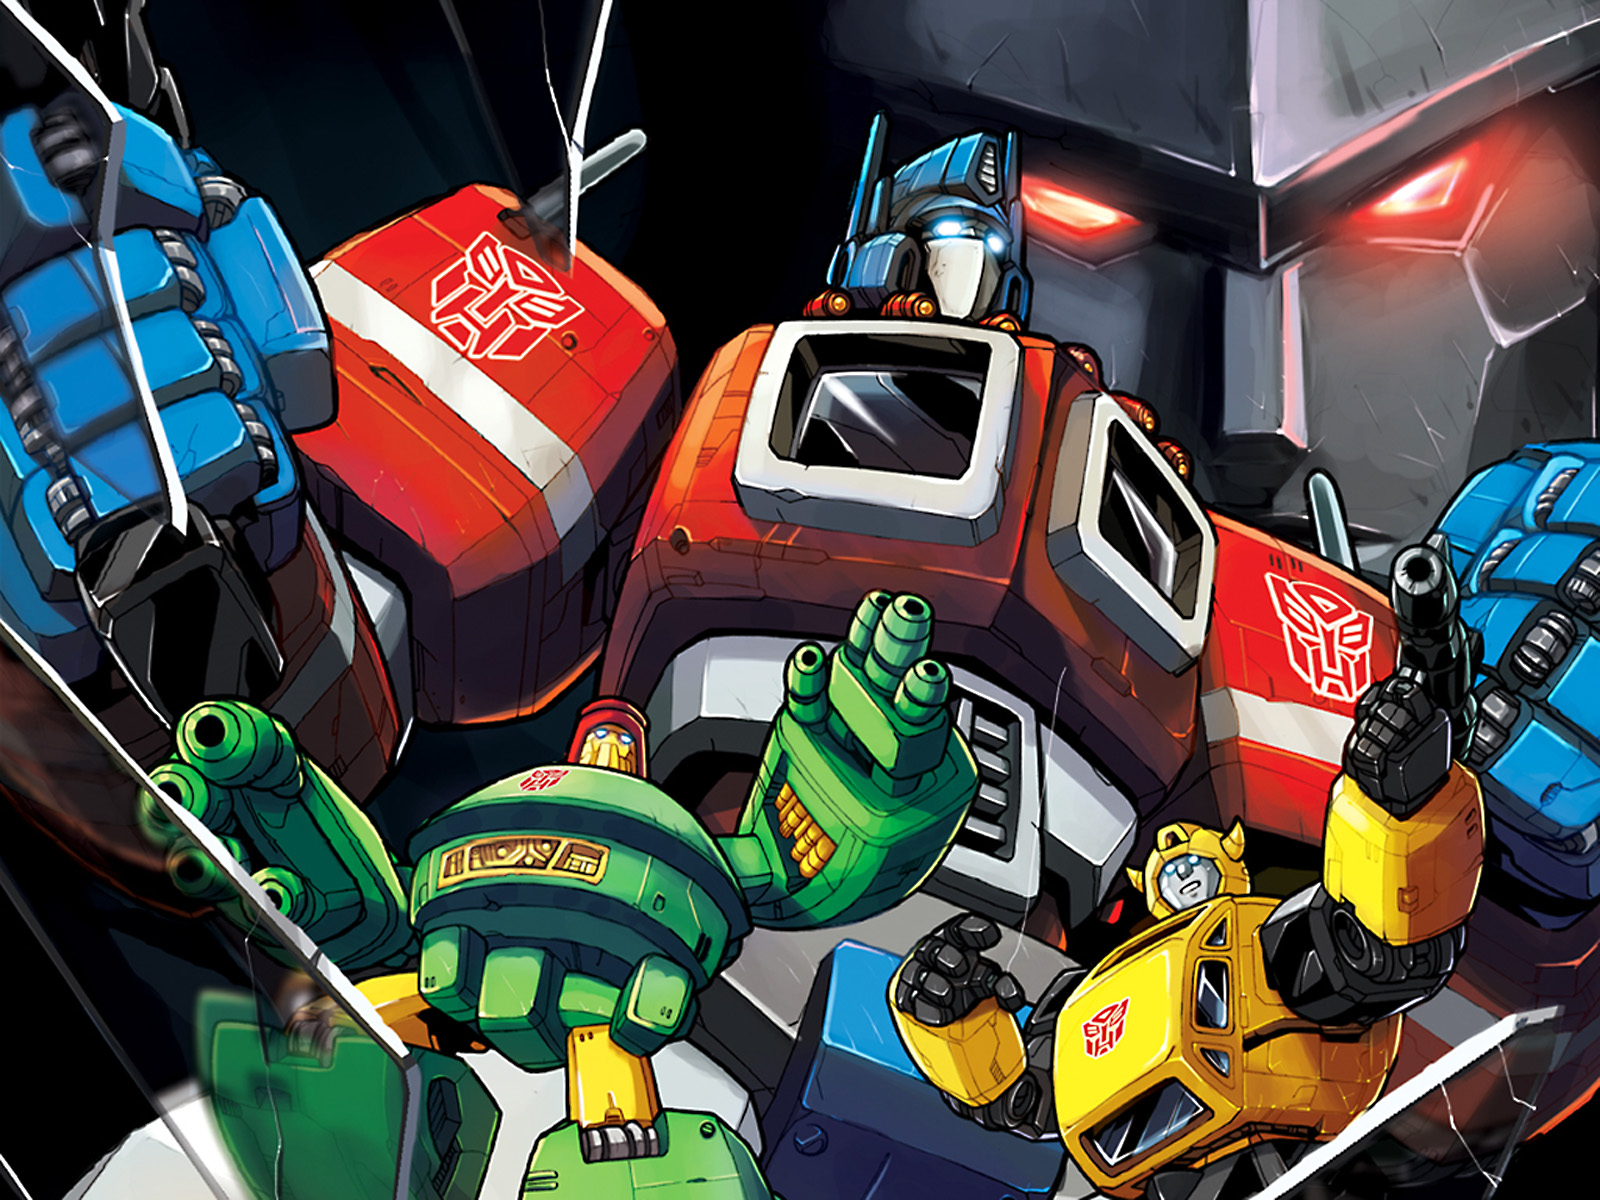 Vancouver Canucks Iphone Wallpaper G1 Autobots Wallpaper Gallery 5 1600 X 1200 Pixels